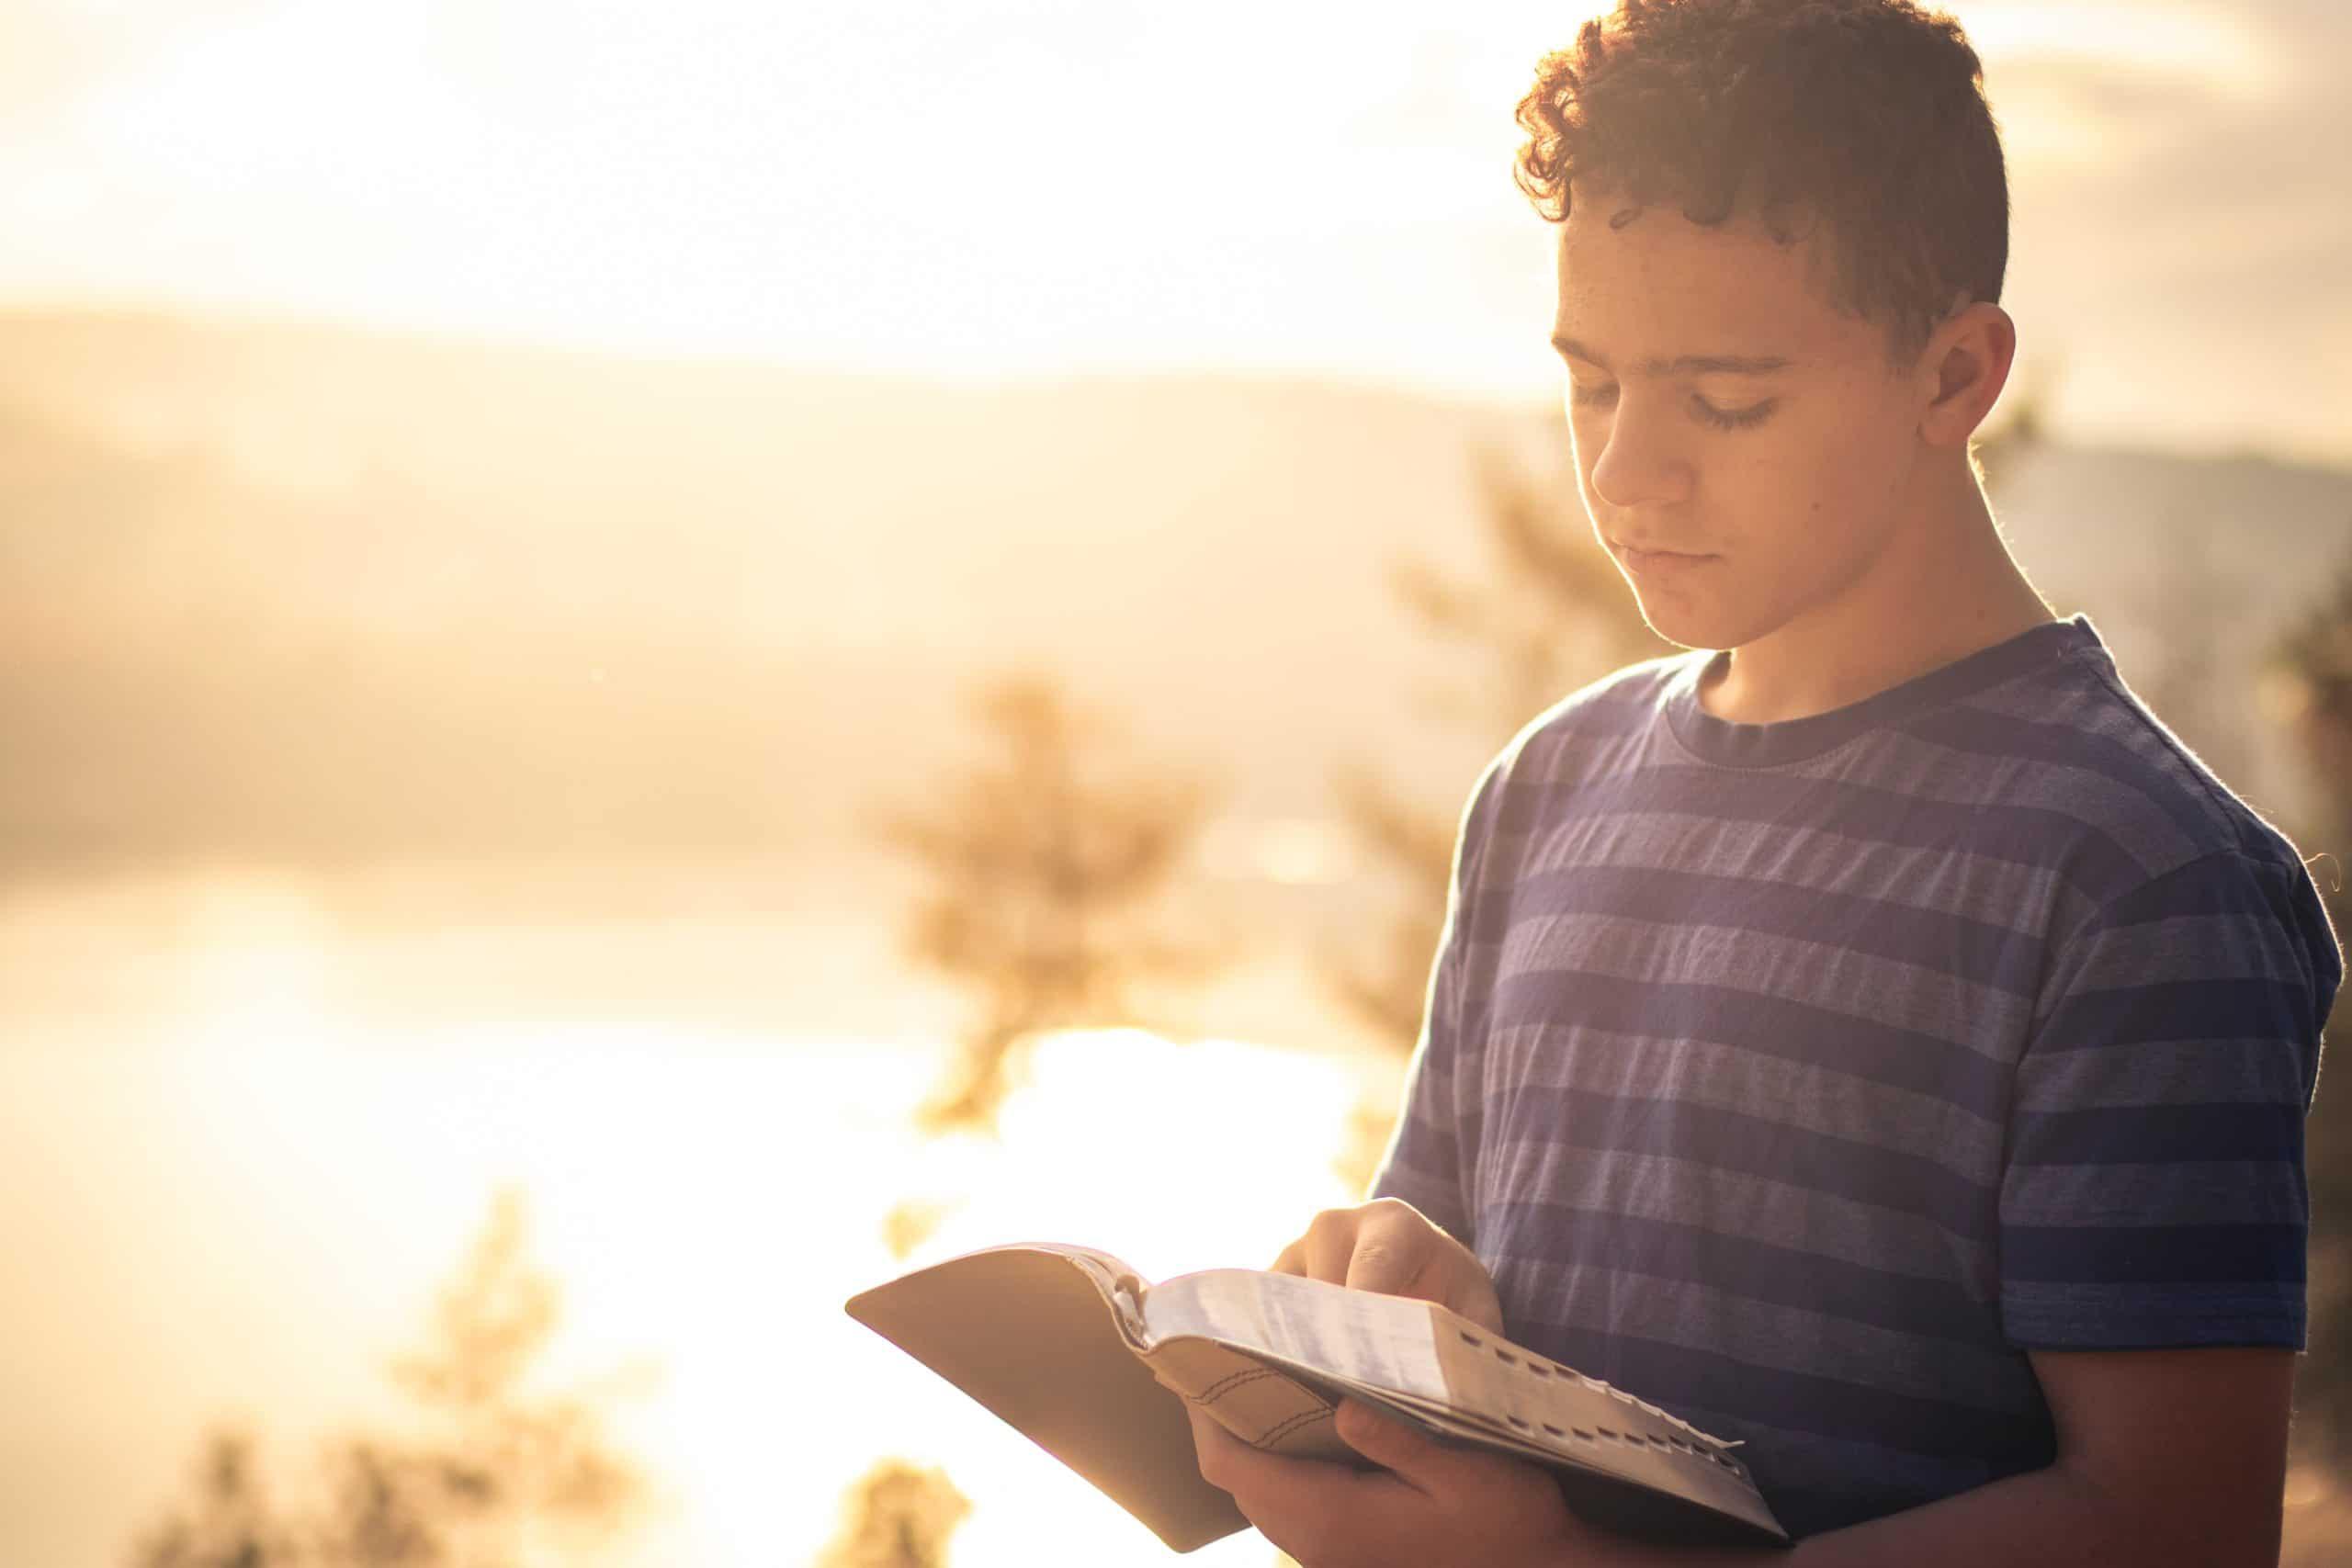 biblical worldview need kids